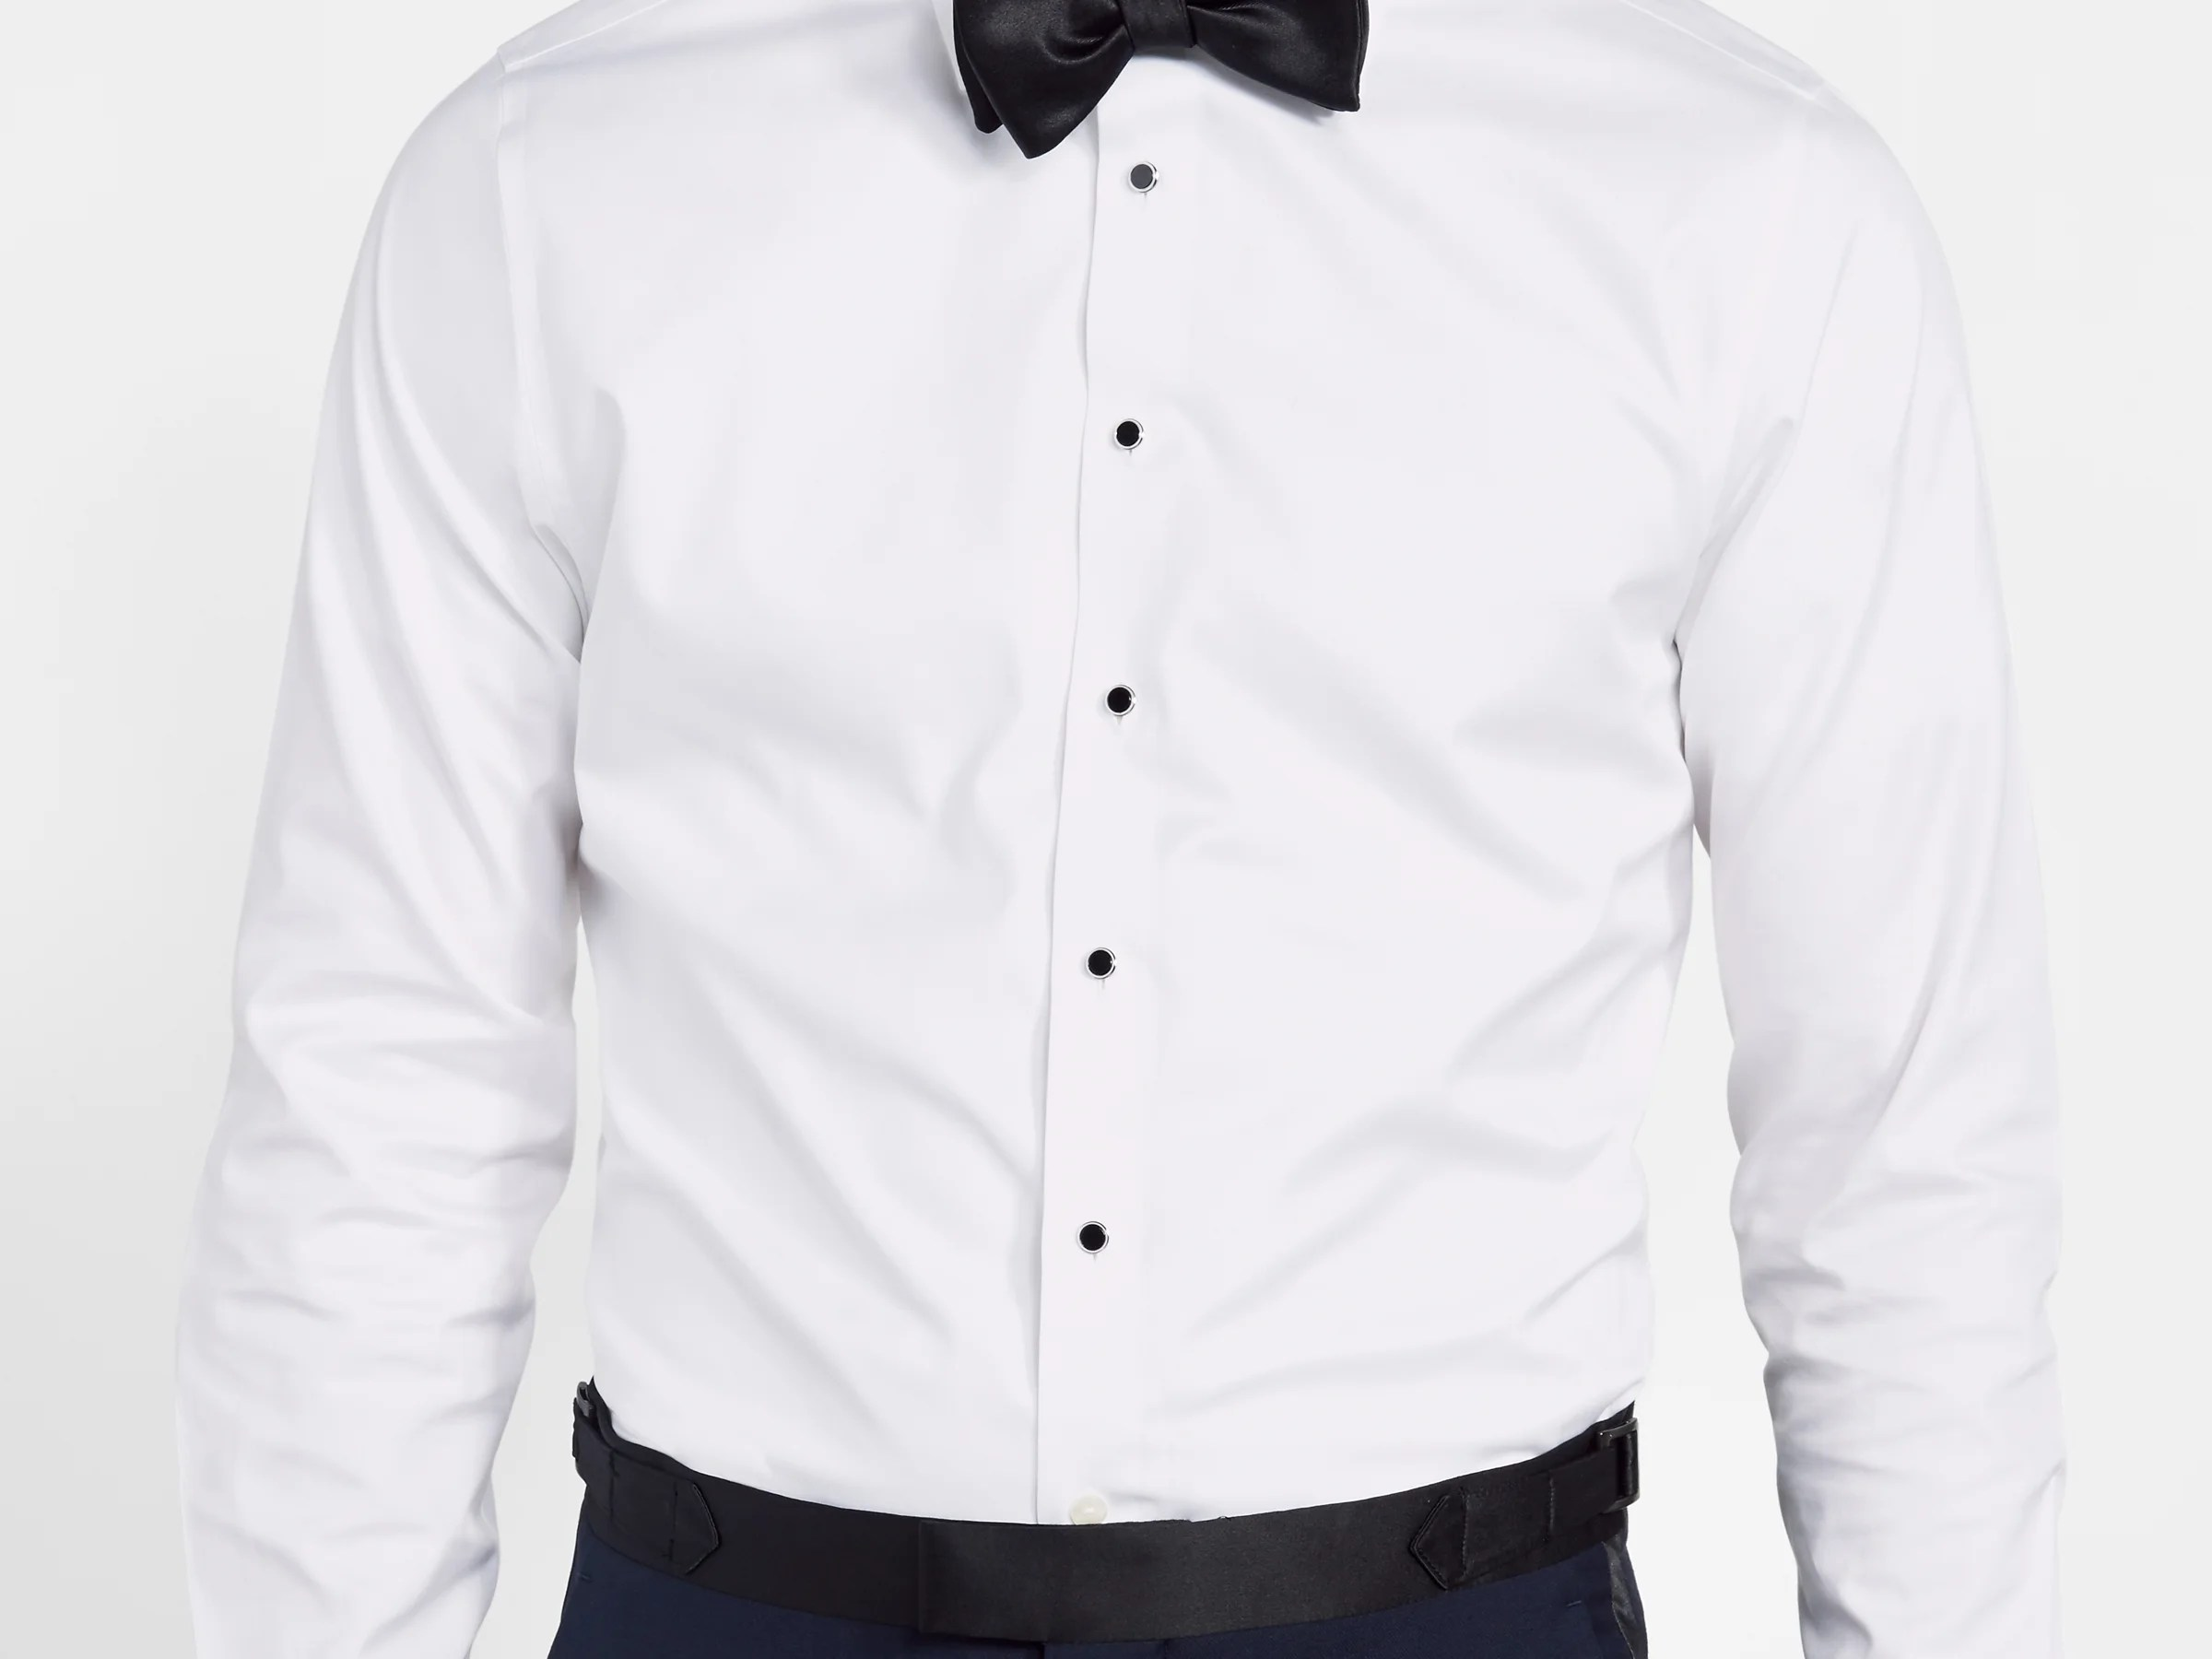 OPEEK Modern Stripe Cufflinks For Mens Shirt 1 pair Fan Shop